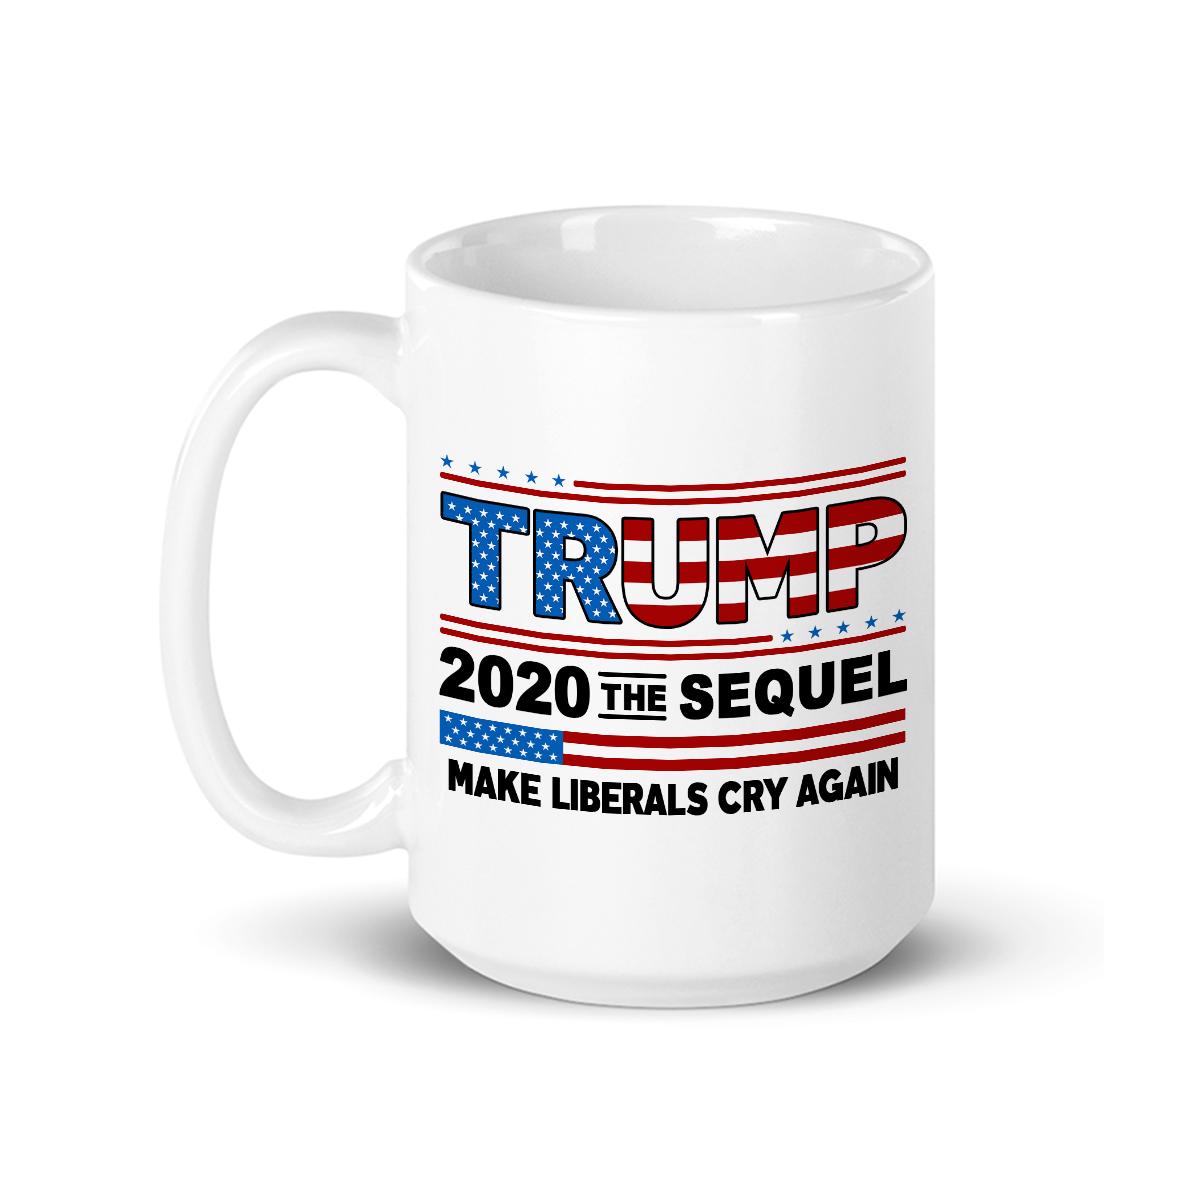 6eff910f1c6 Donald Trump Election 2020 Make Liberals Cry and 50 similar items. Trum 2020  b mug w 6